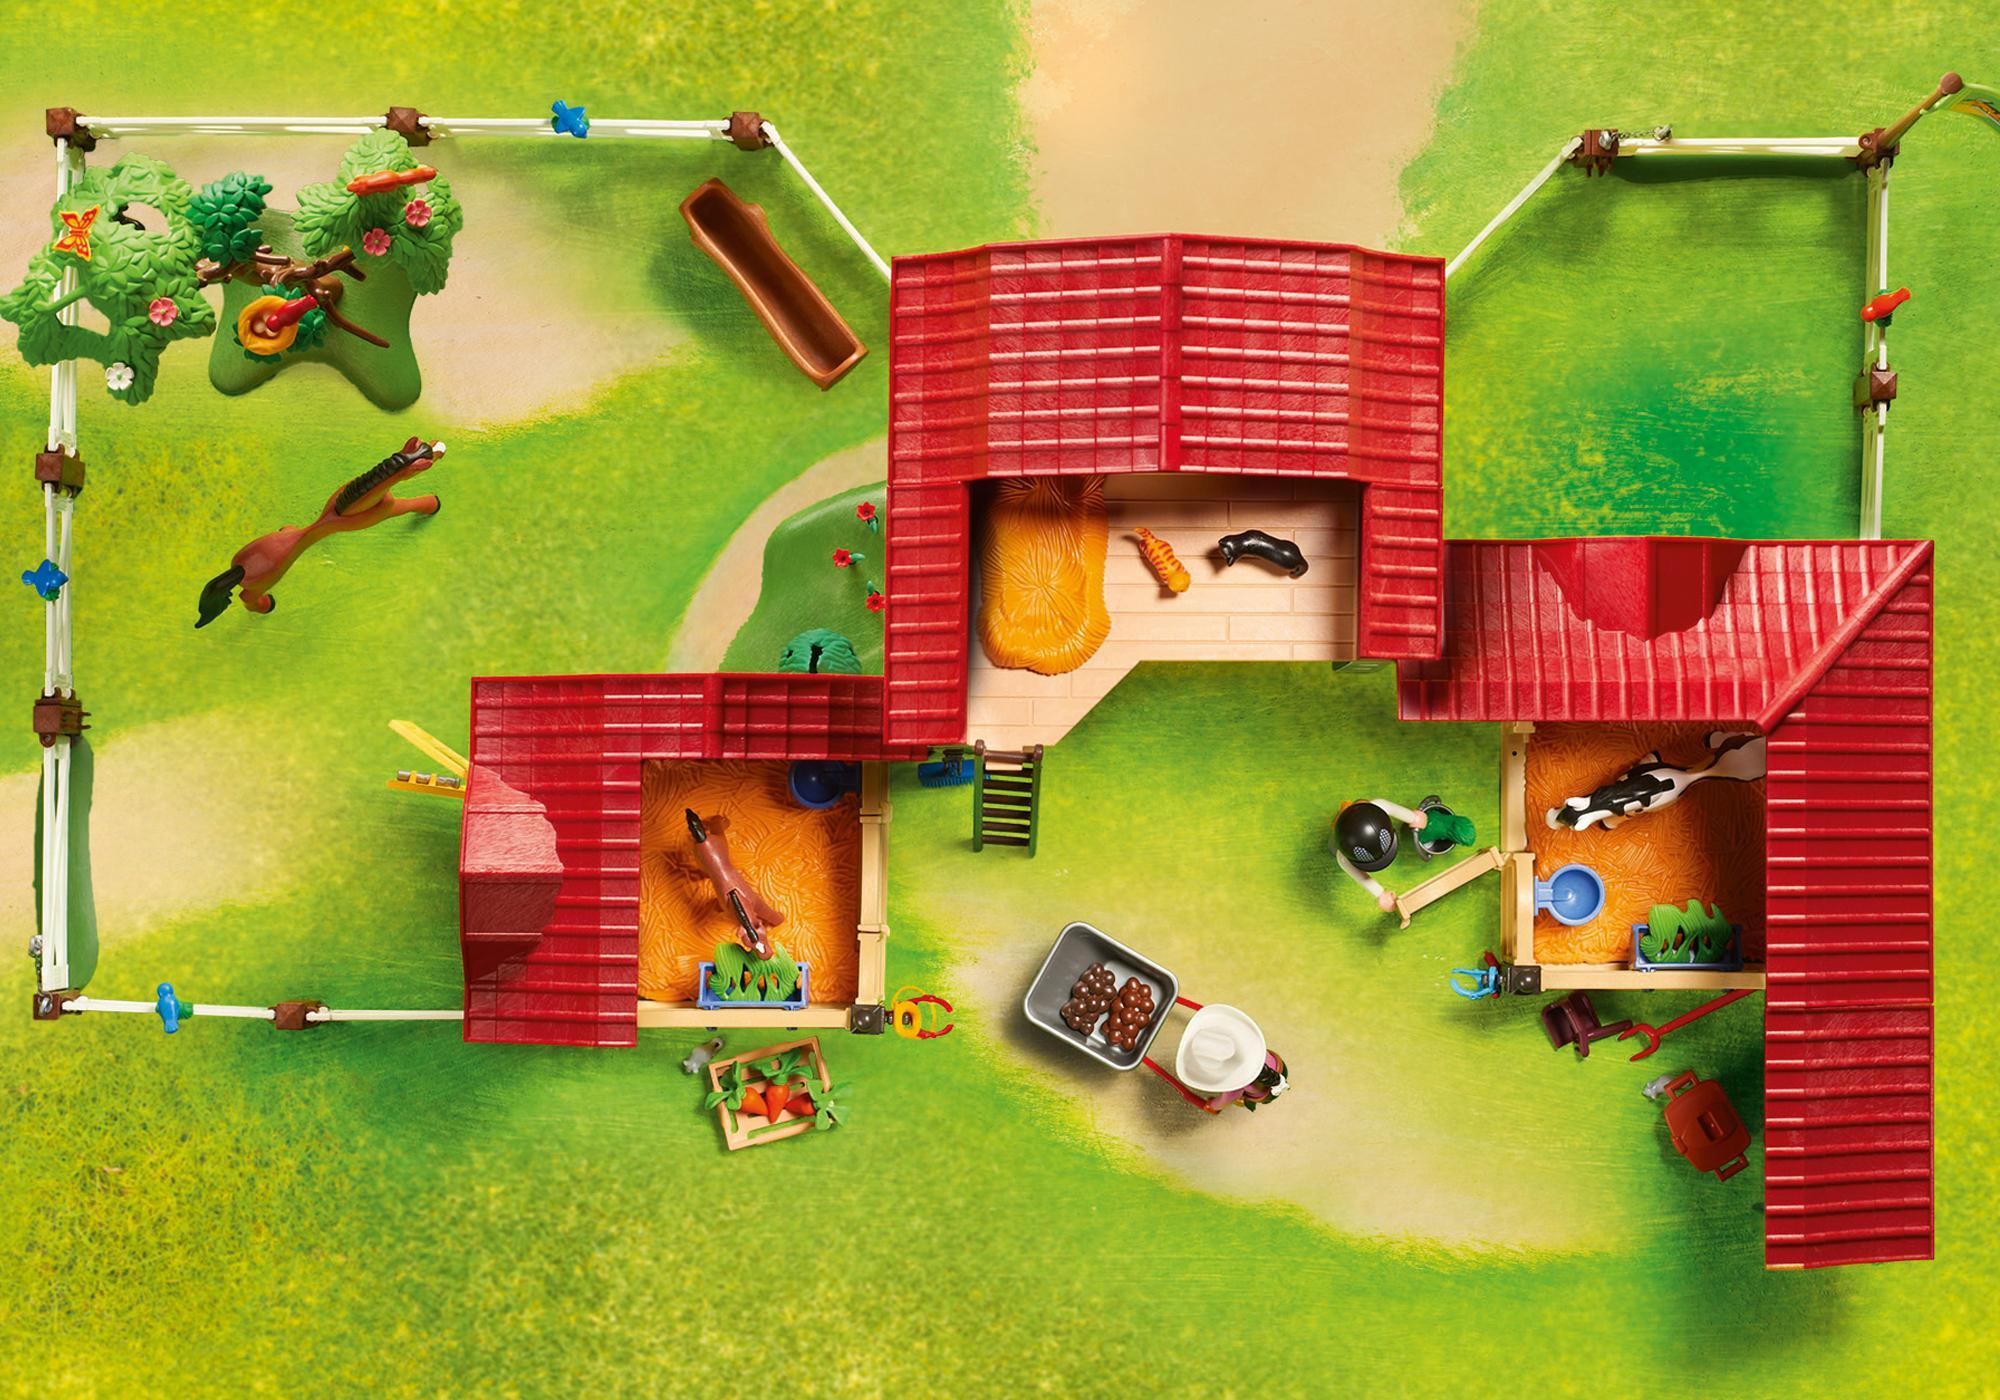 http://media.playmobil.com/i/playmobil/6926_product_extra1/Μεγάλος Ιππικός Όμιλος